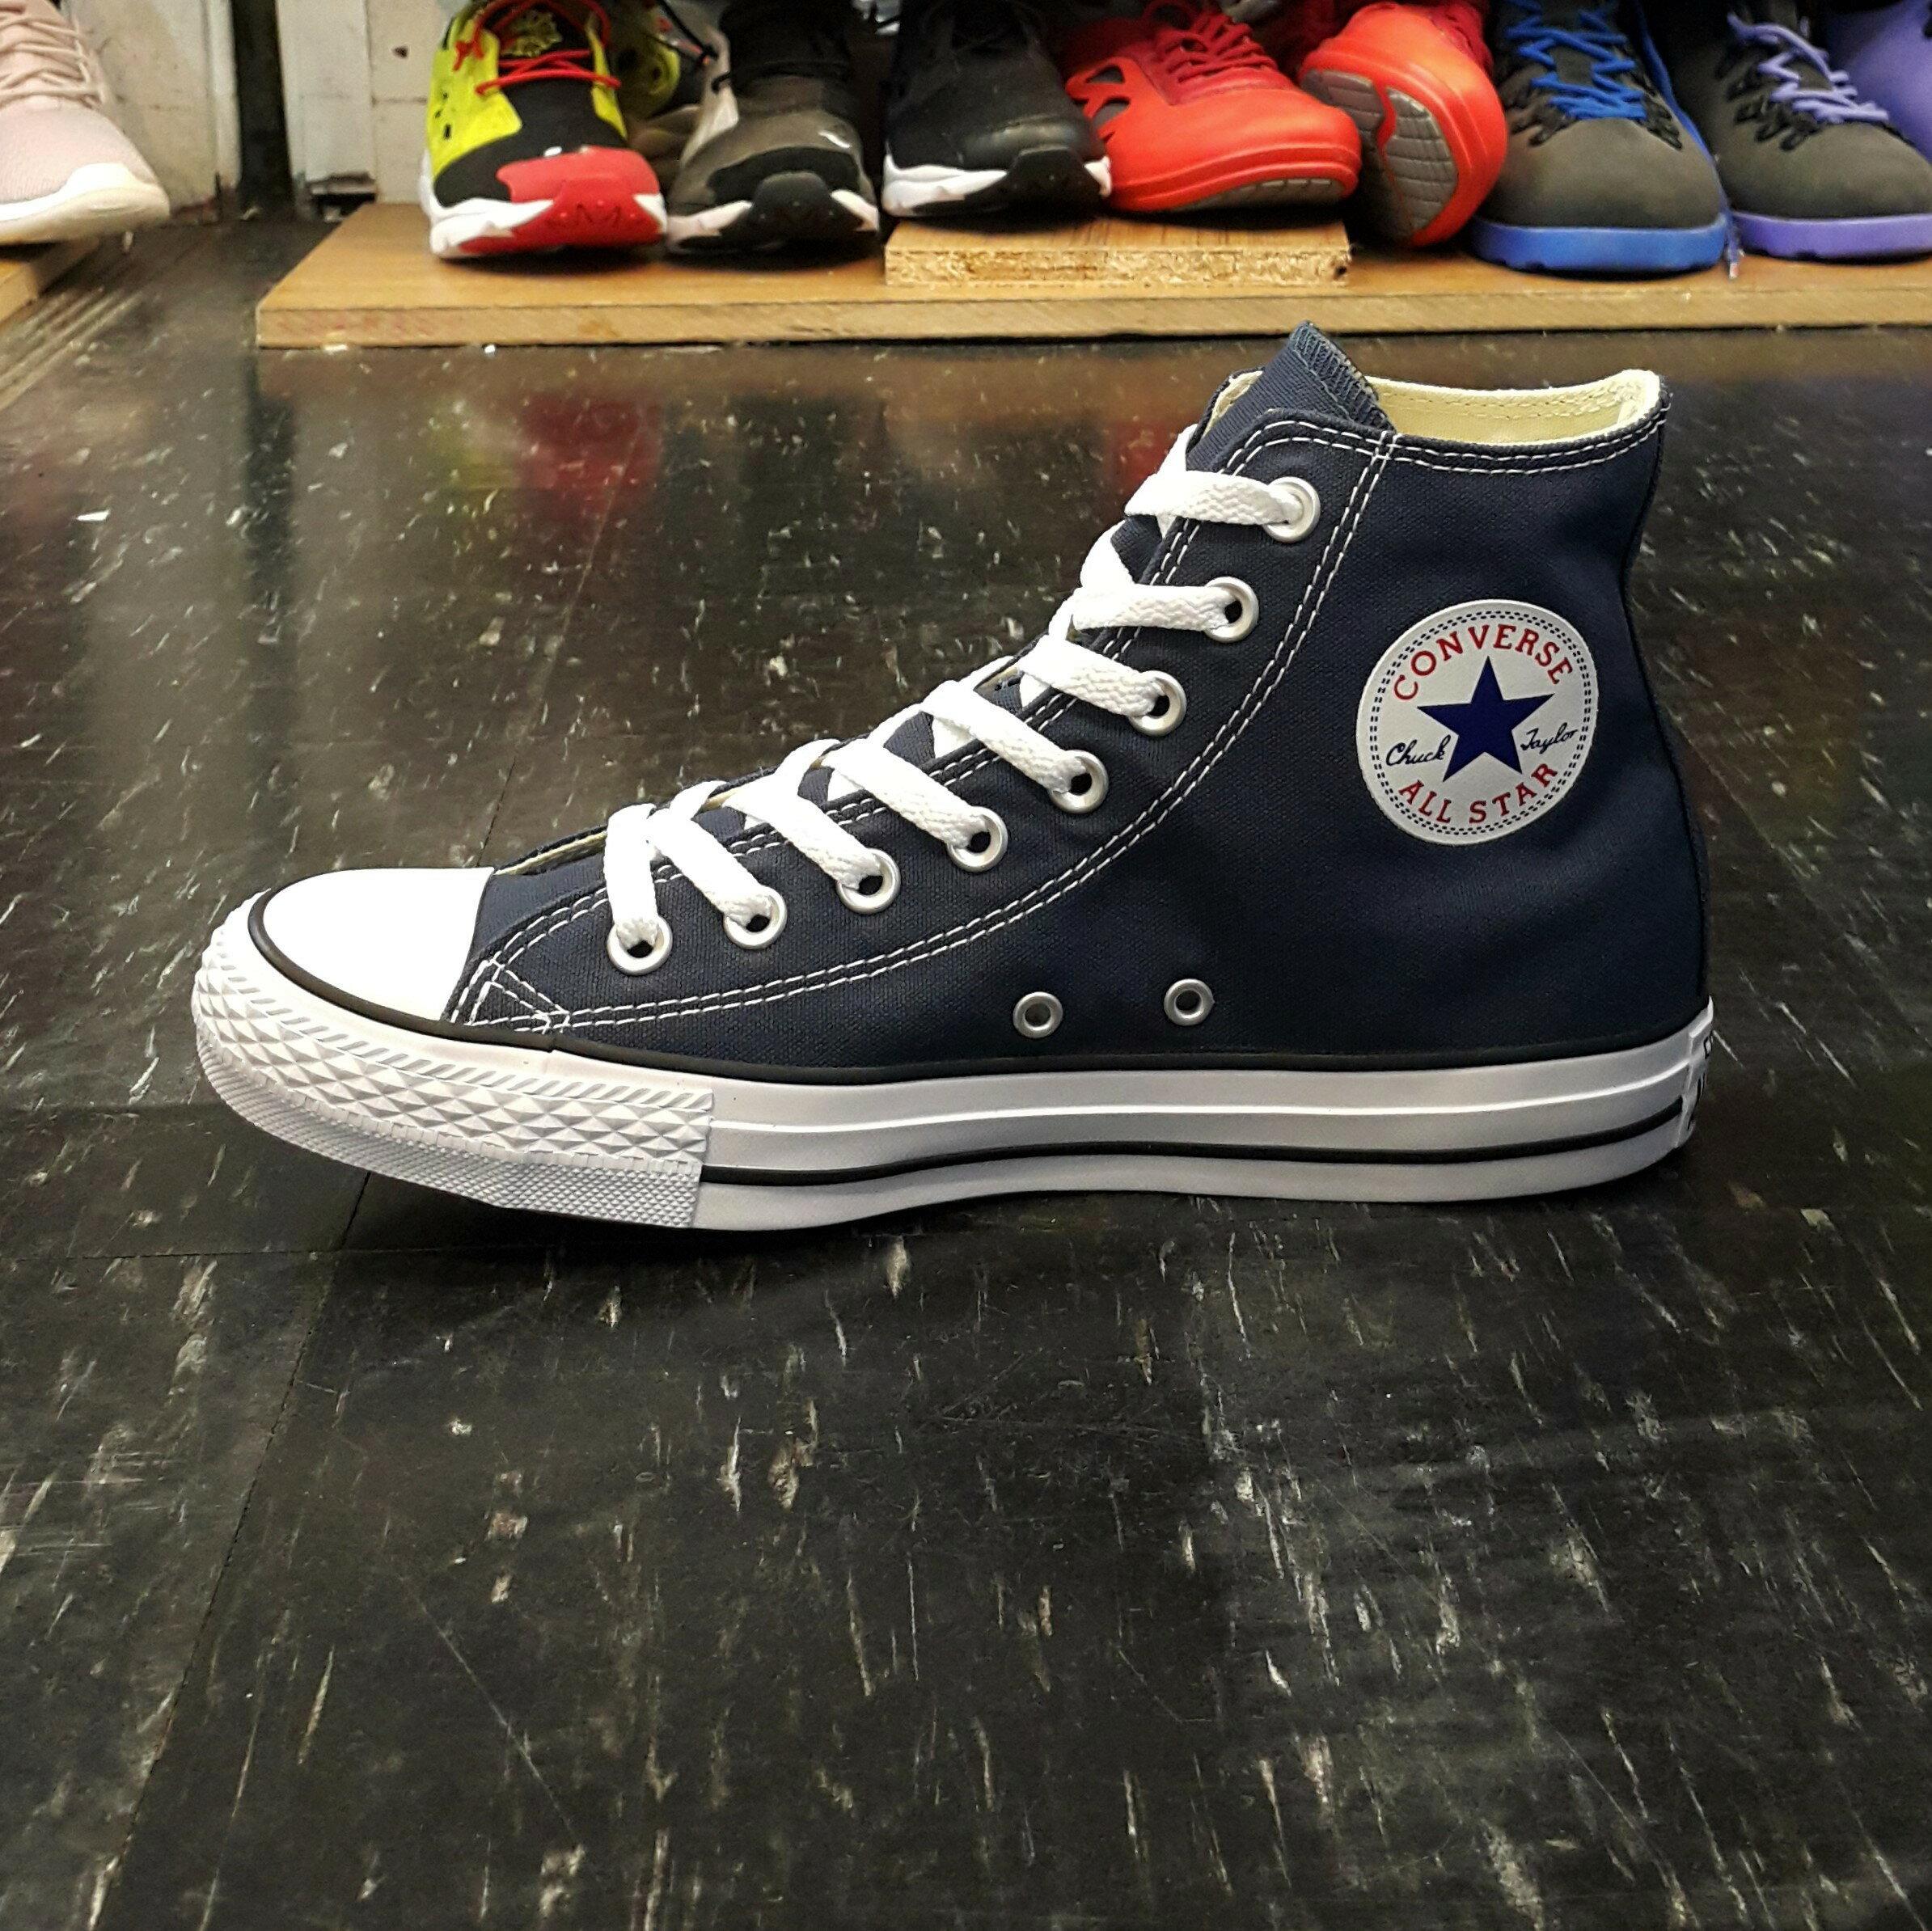 Converse Chuck Taylor All Star 基本款 帆布 高筒 藍色 海軍藍 深藍色 M9622C